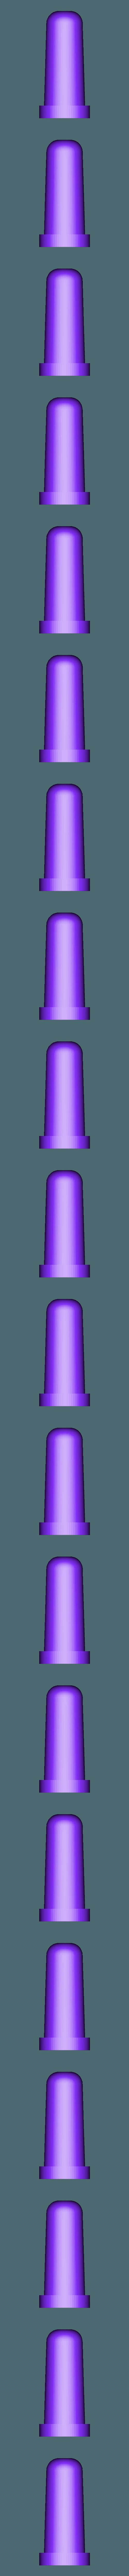 embroidery_bobbin_bit_peg.stl Download free STL file Embroidery Bobbin Drill Bit • 3D printer object, ericcherry